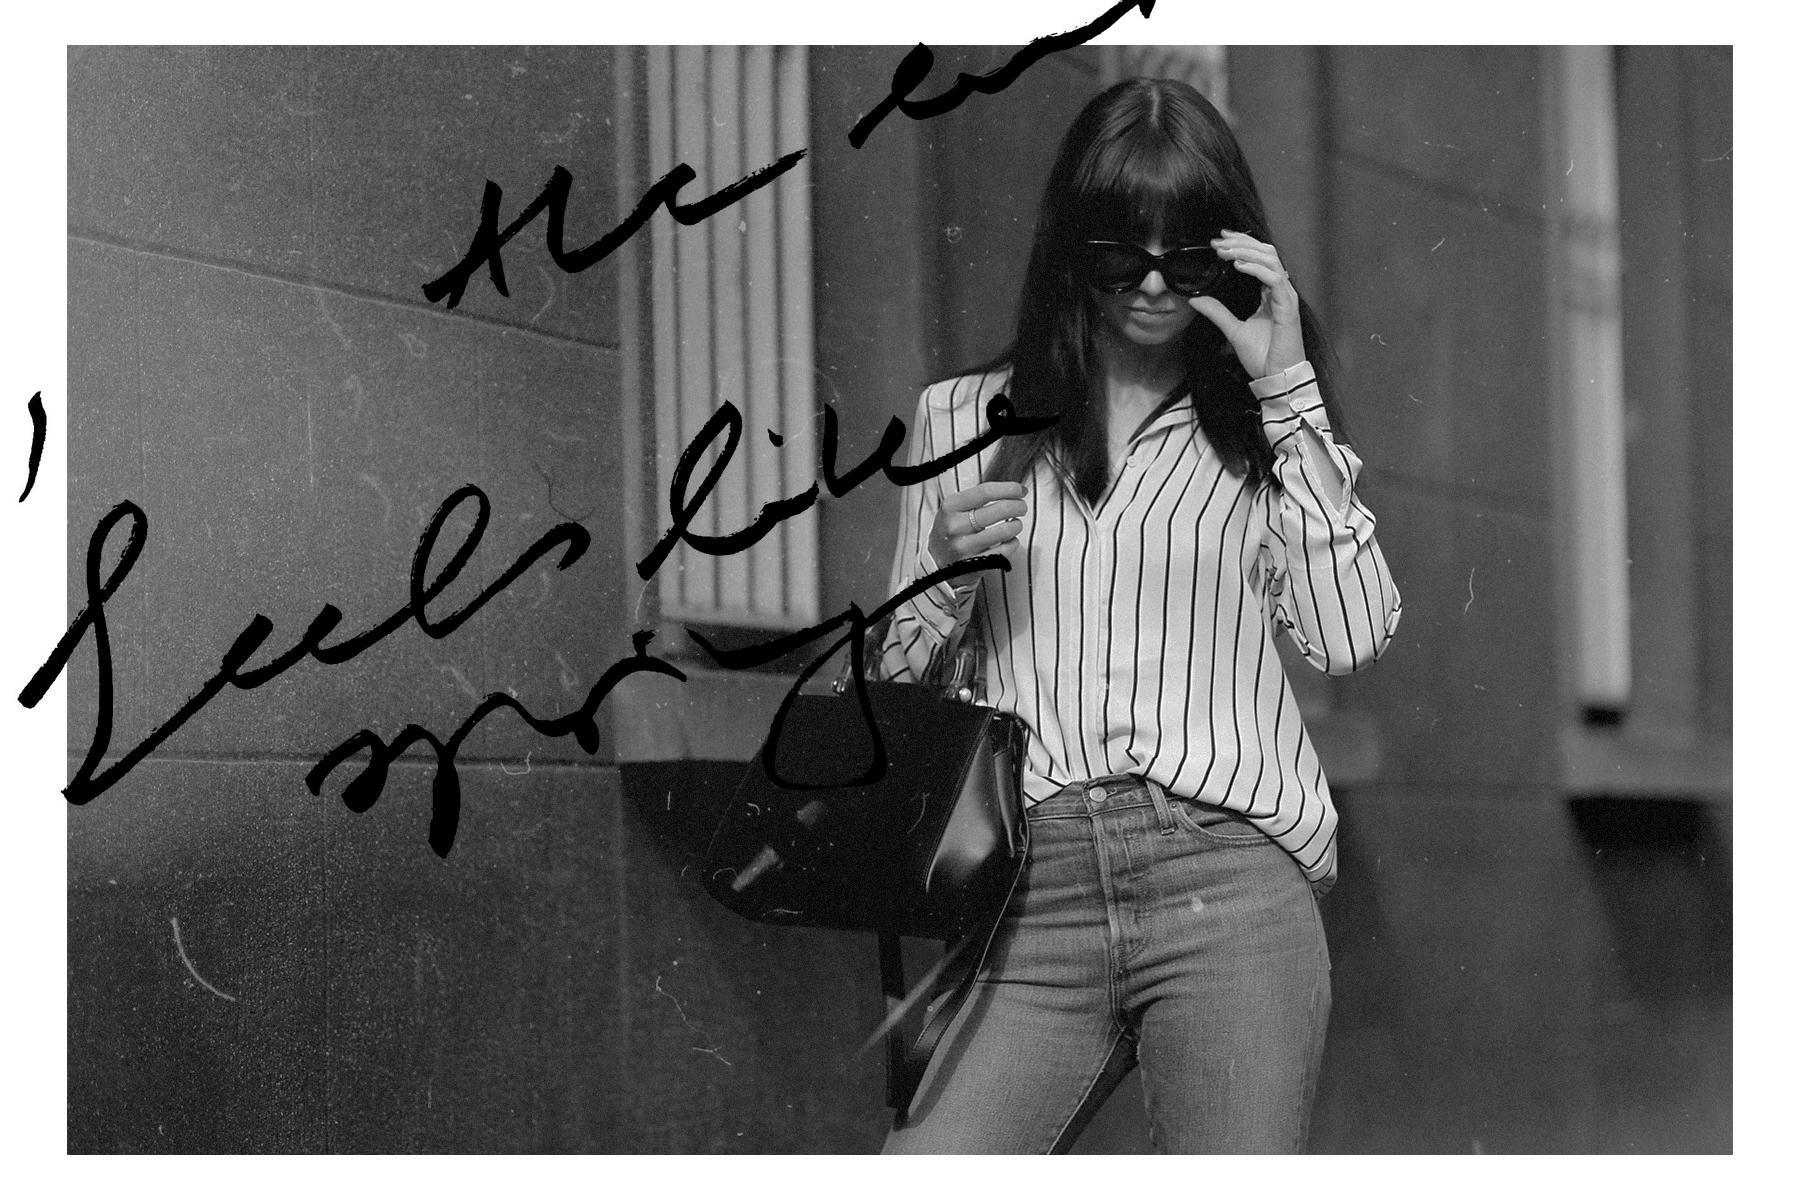 stripe blouse gucci nymphaea bag bamboo ysl saint laurent sandals slipper levi's jeans céline audrey sunglasses spring outfit minimal parisienne chic brunette bangs madame ricarda schernus cats&dogs blog modeblogger ootd outfitblogger düsseldorf 3